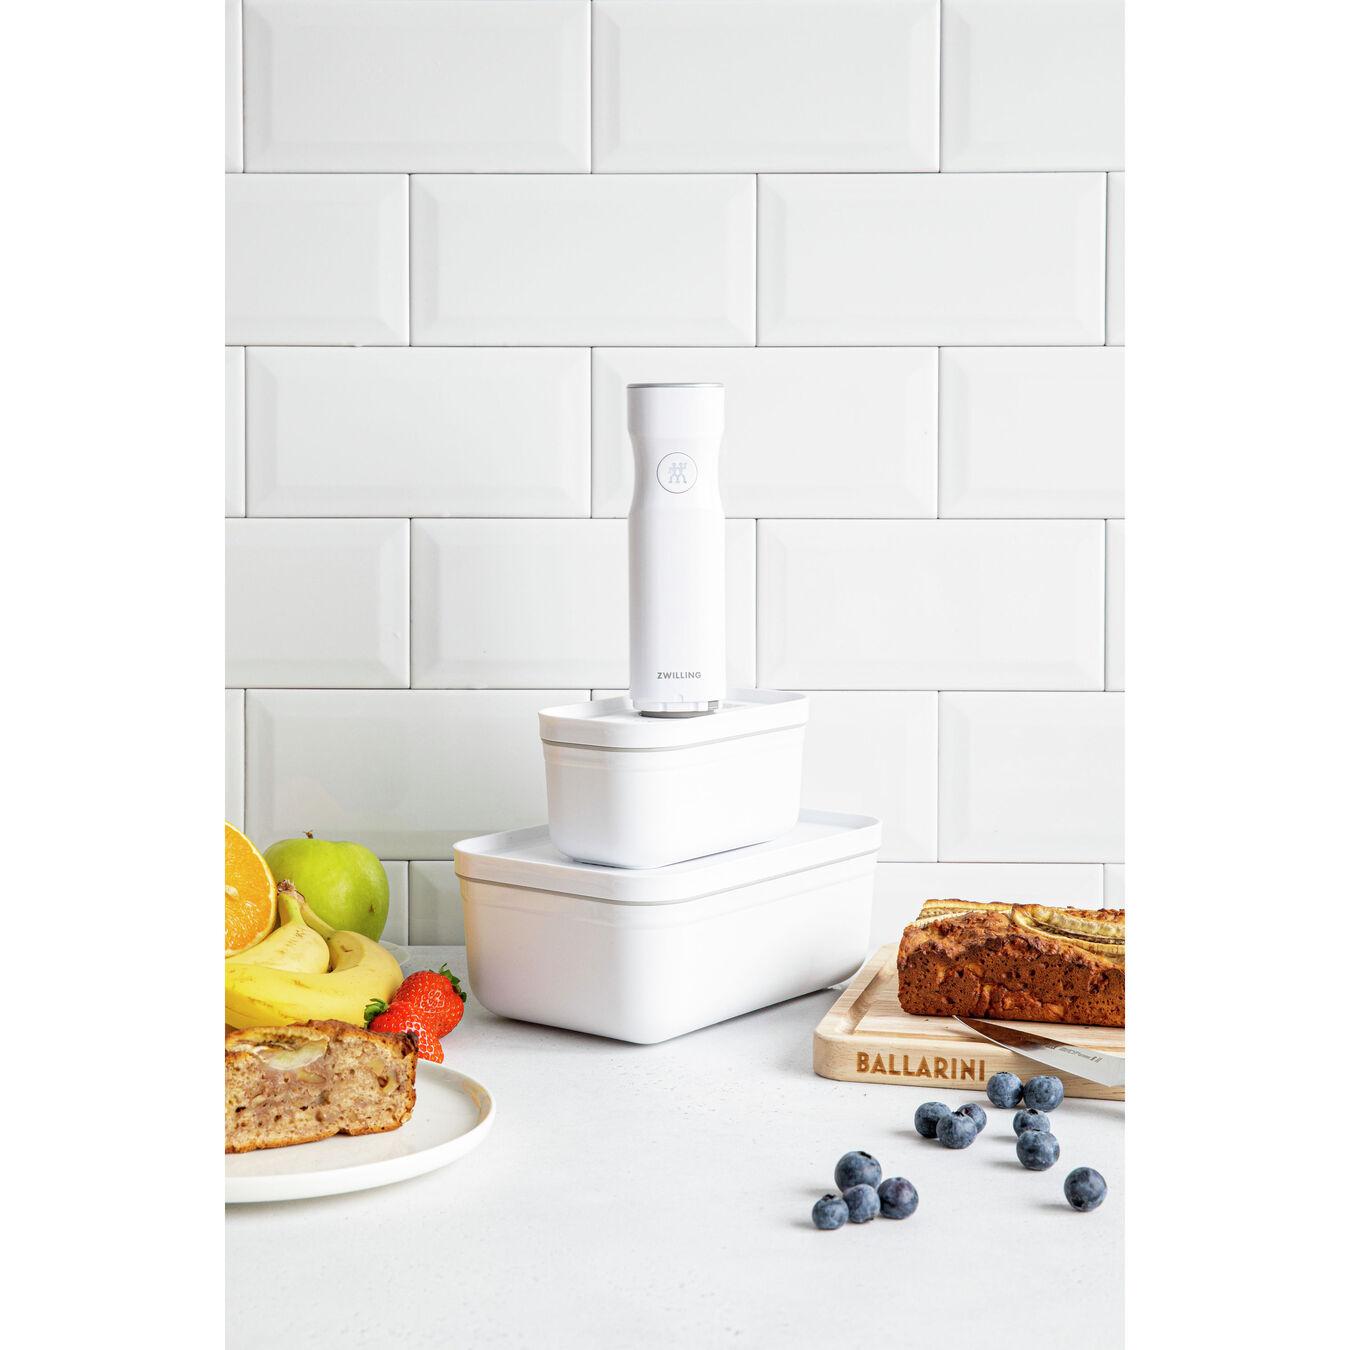 Vakuum Lunchbox, S, Kunststoff, Weiß,,large 4